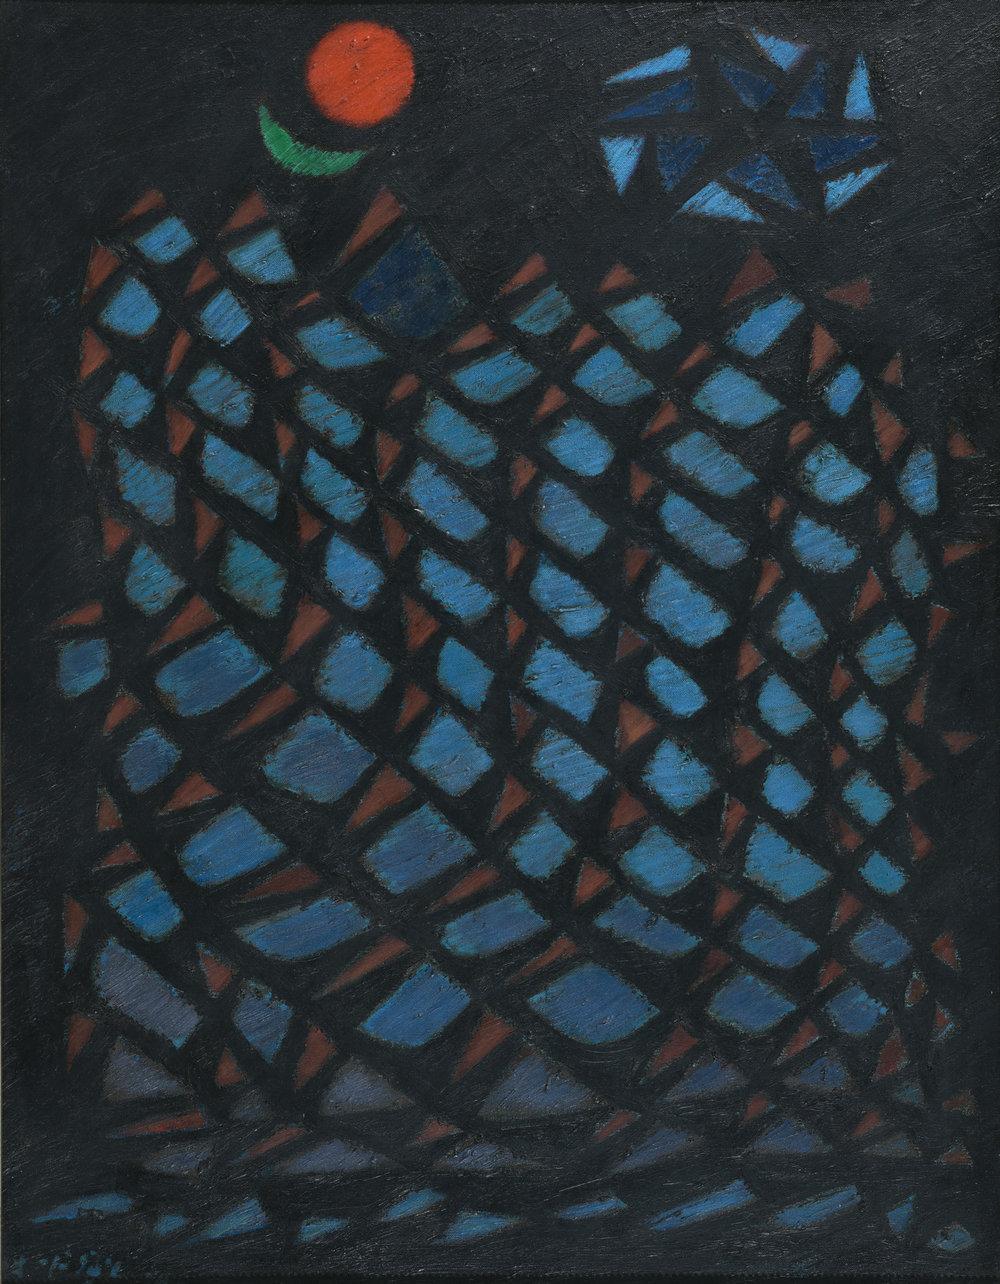 Fadjar Sidik (Indonesian, 1930-2004)